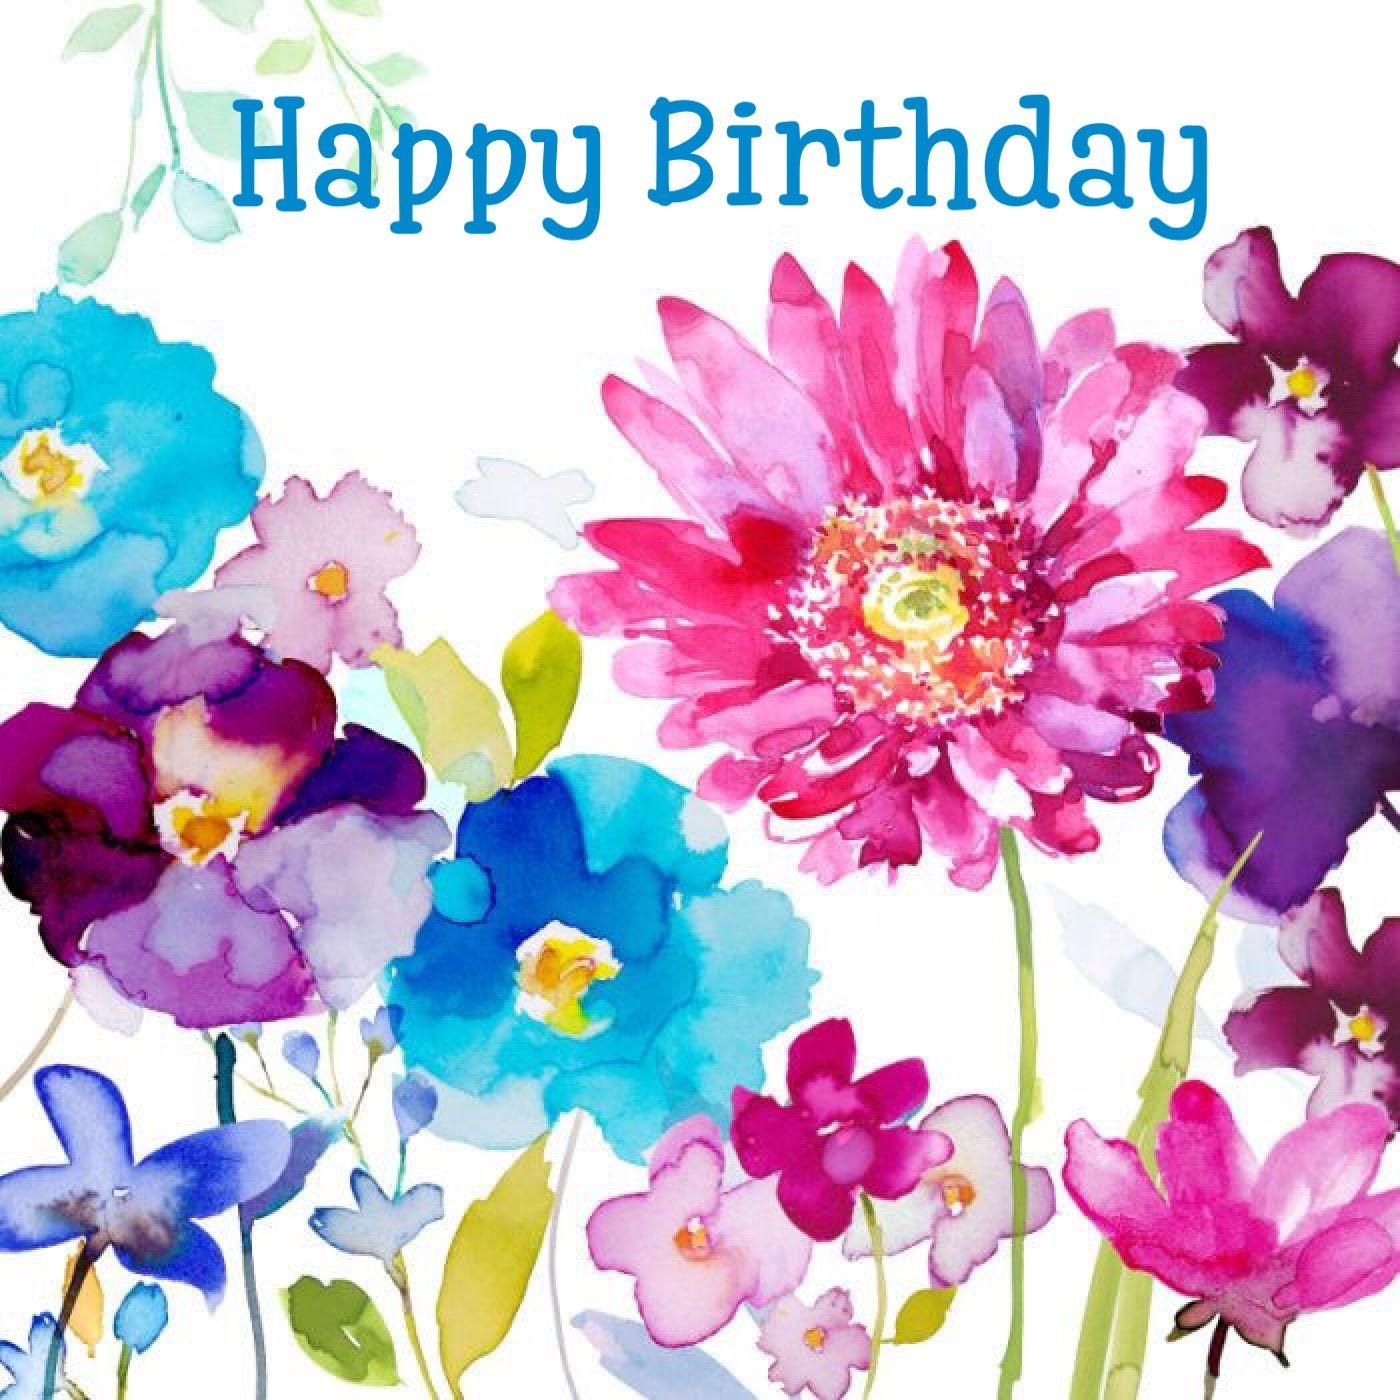 Happy birthday birthday pinterest happy birthday birthdays happy birthday kristyandbryce Gallery